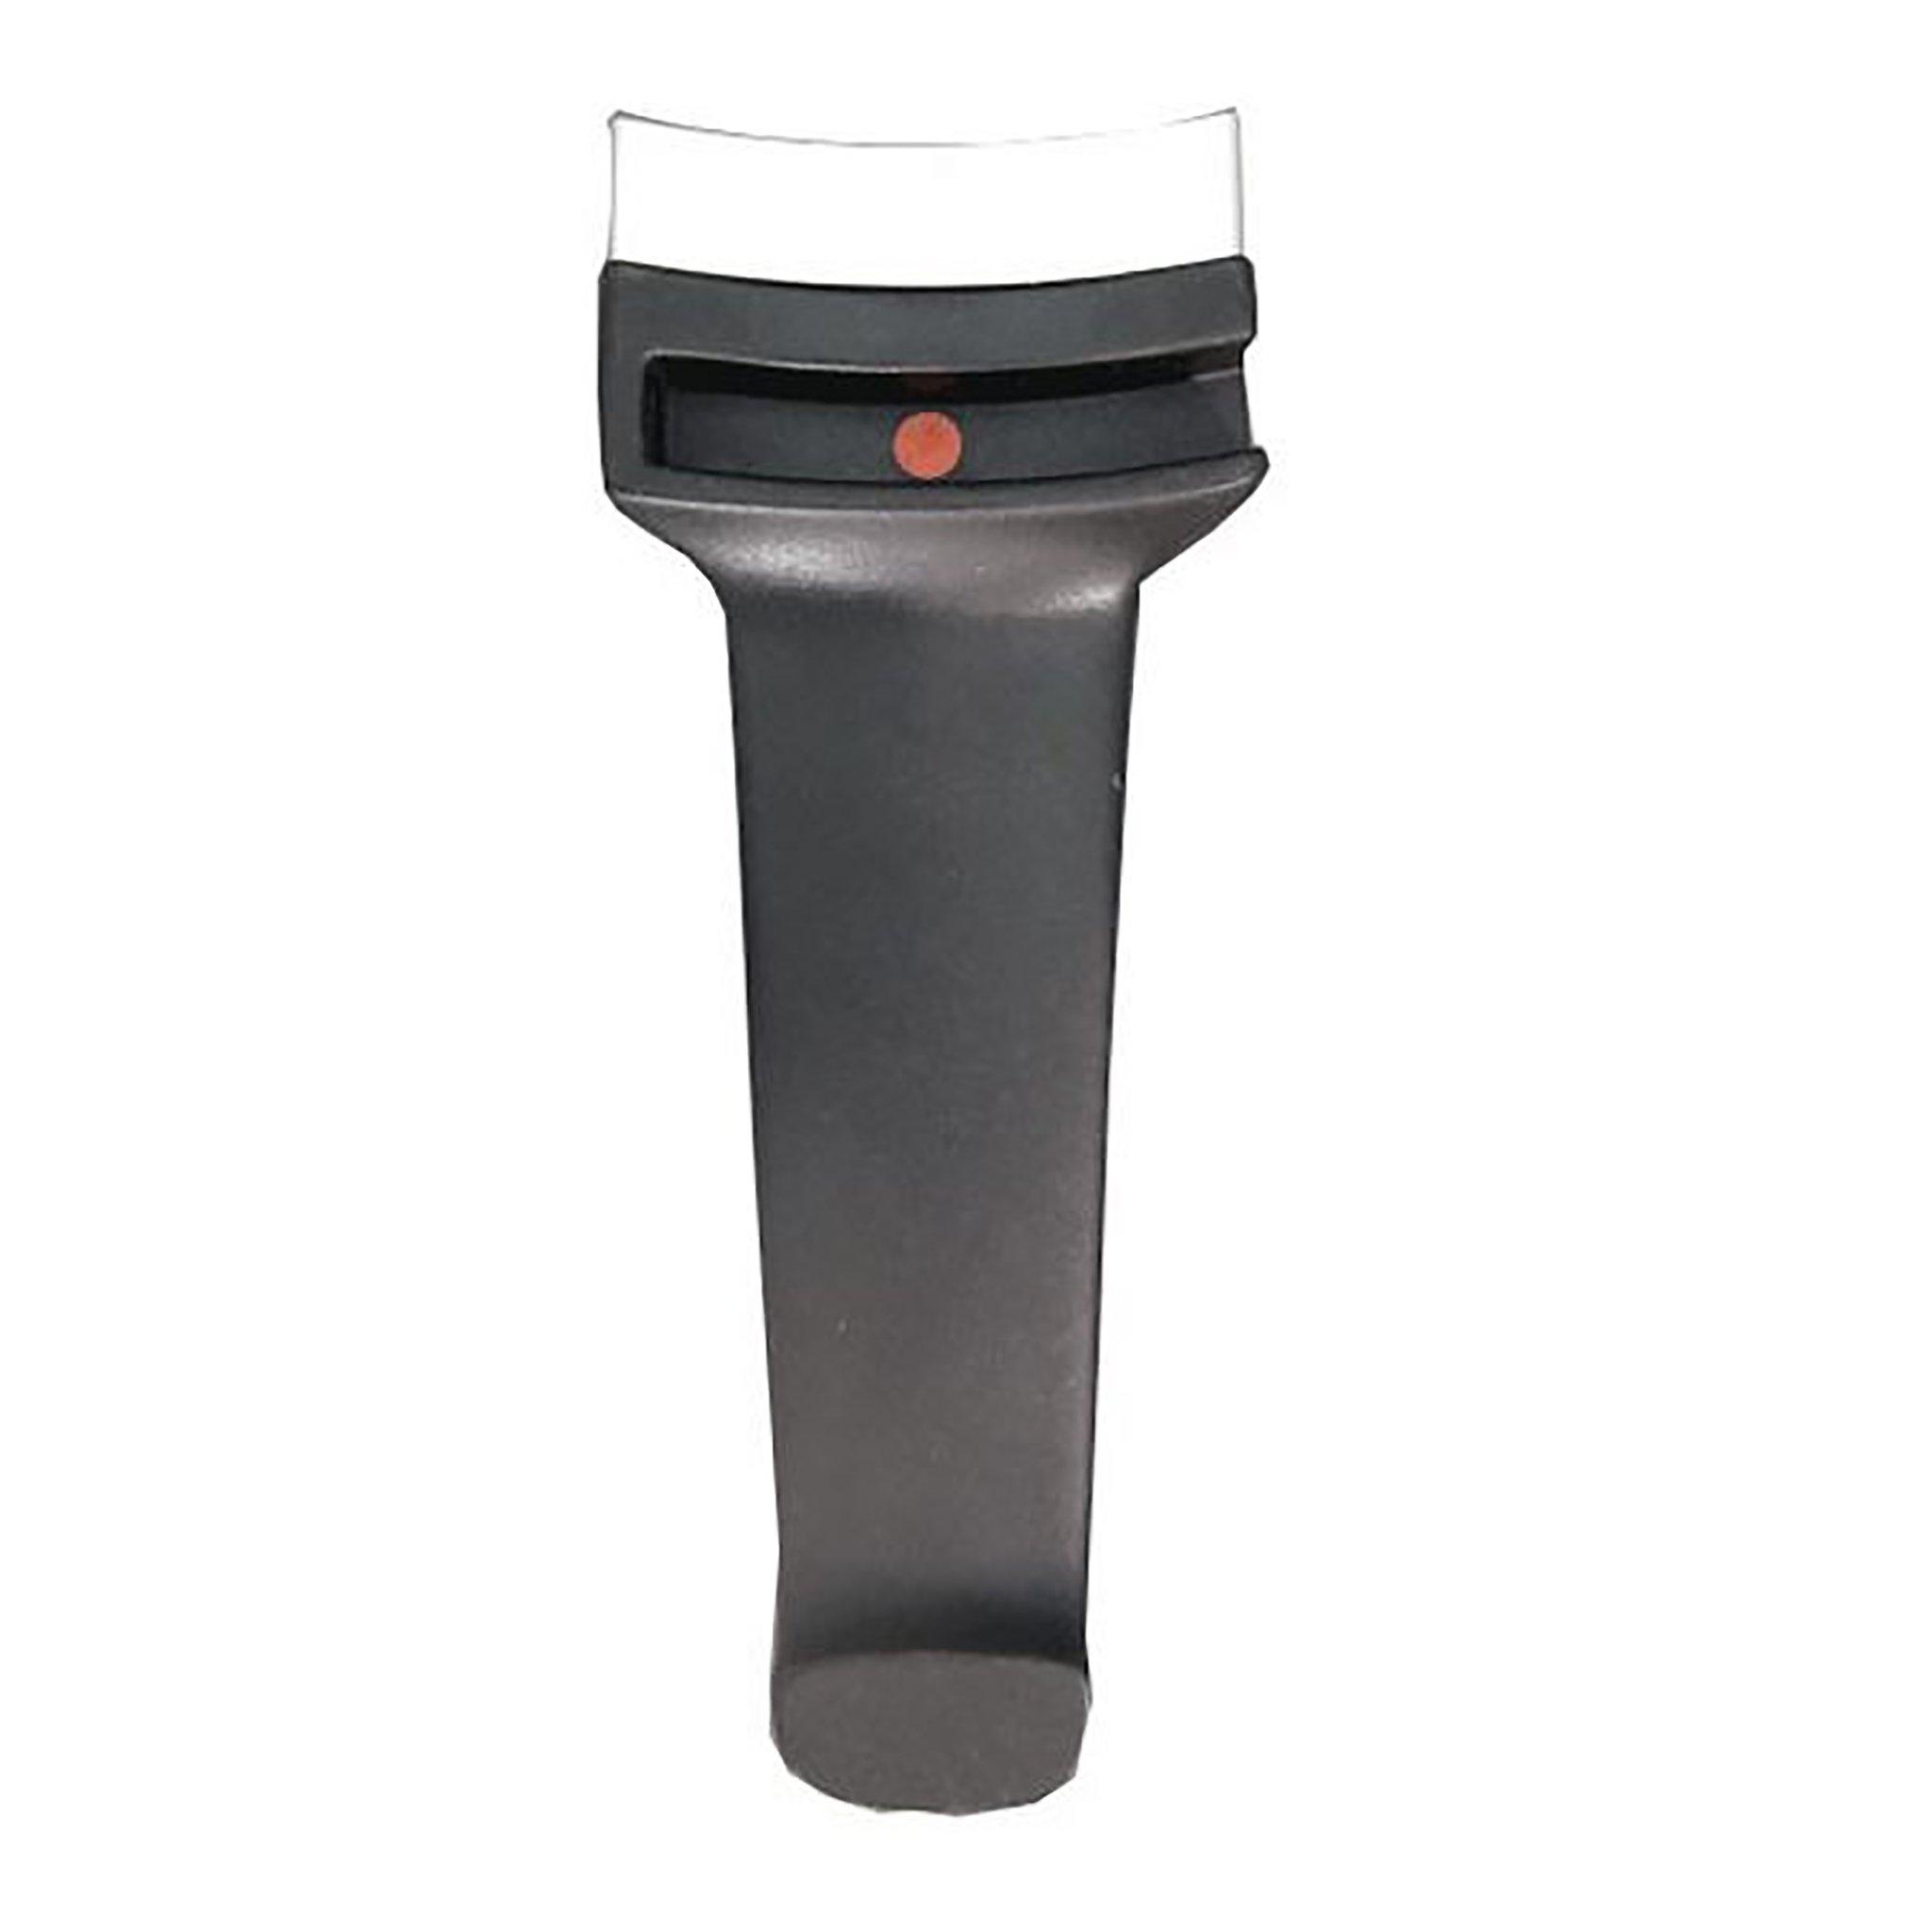 Fissler Body Handle for Pressure Skillet (New) 2.5L